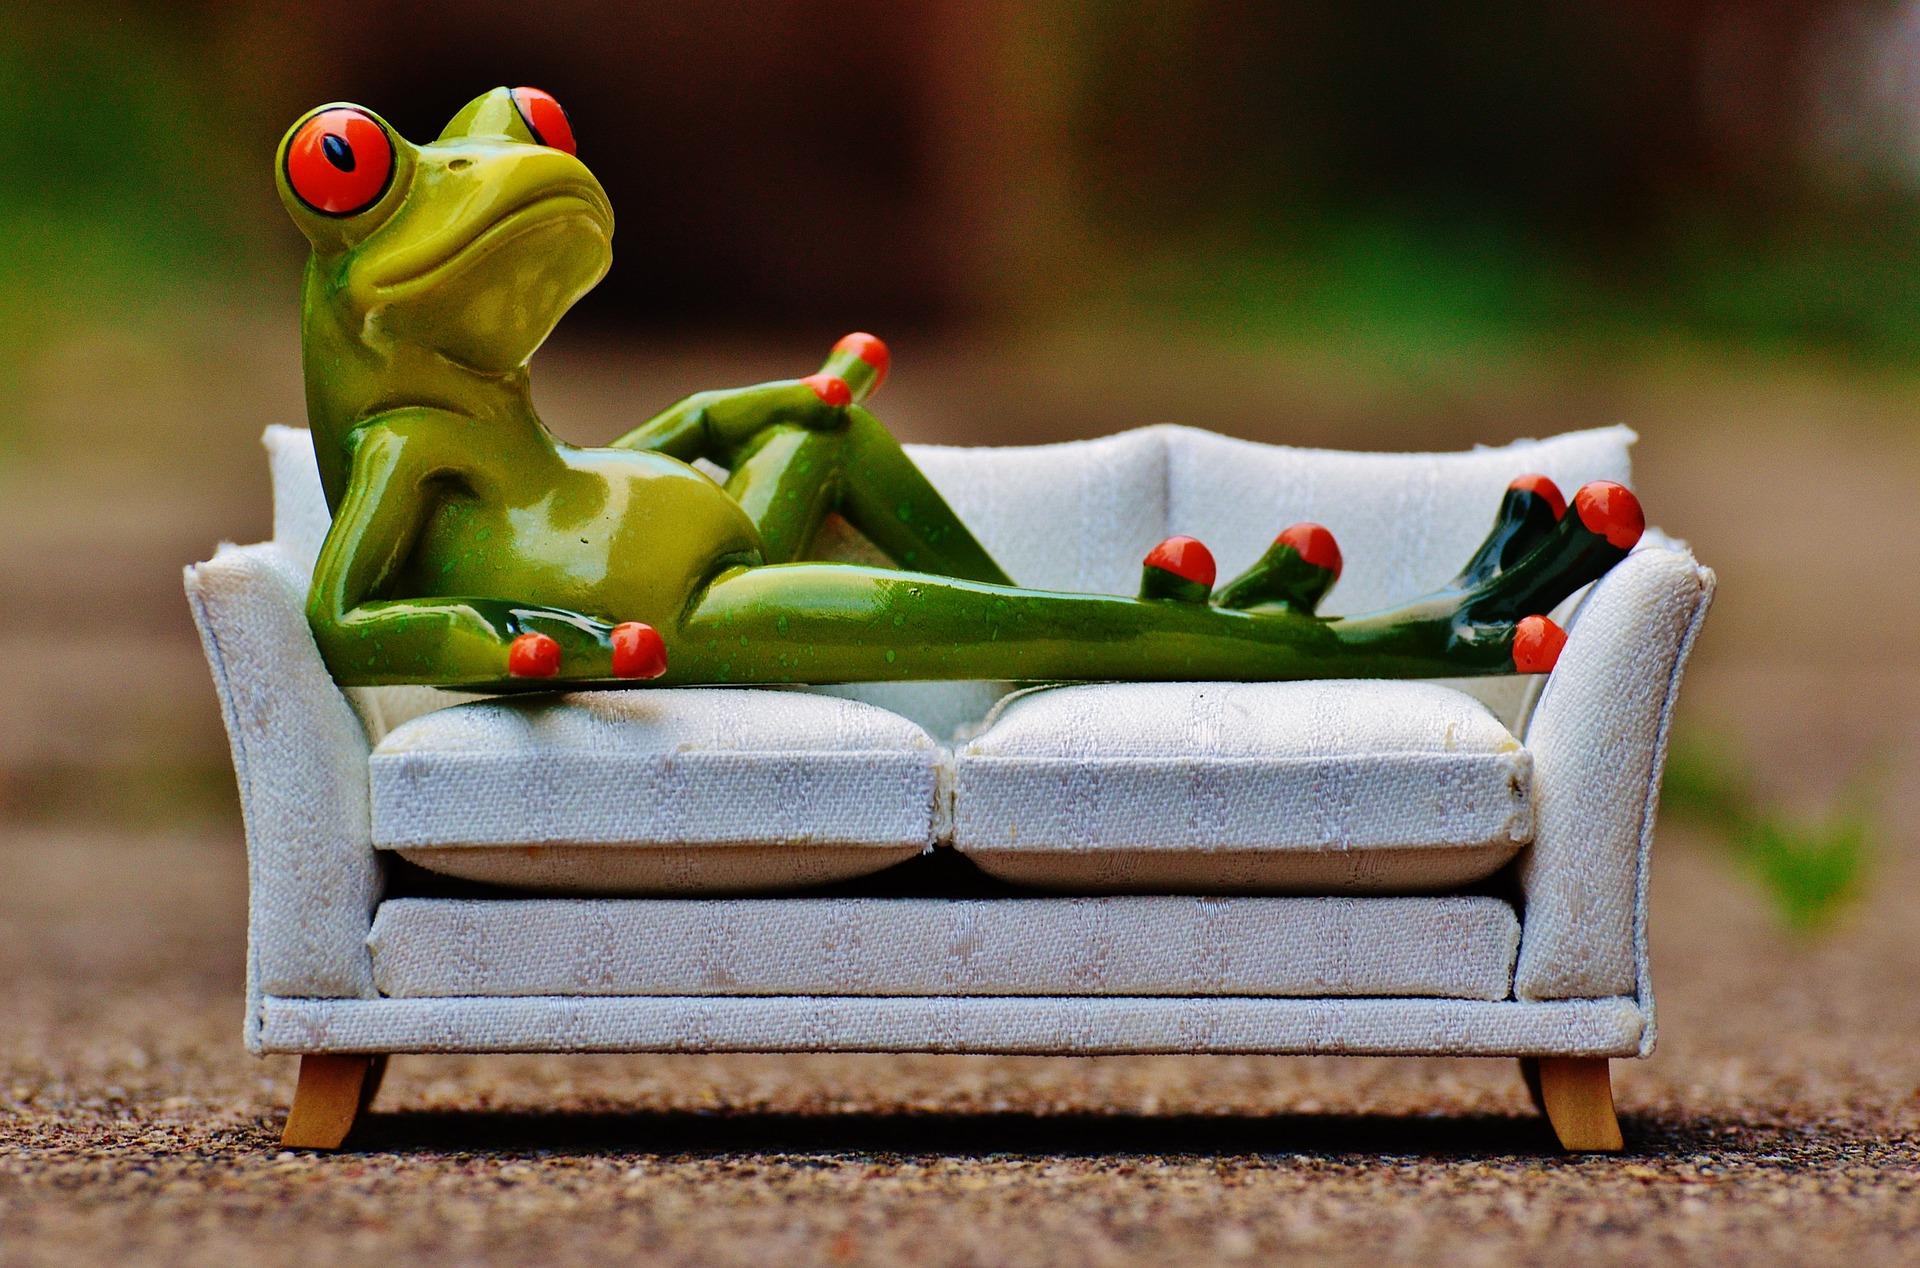 frog-1073426_1920